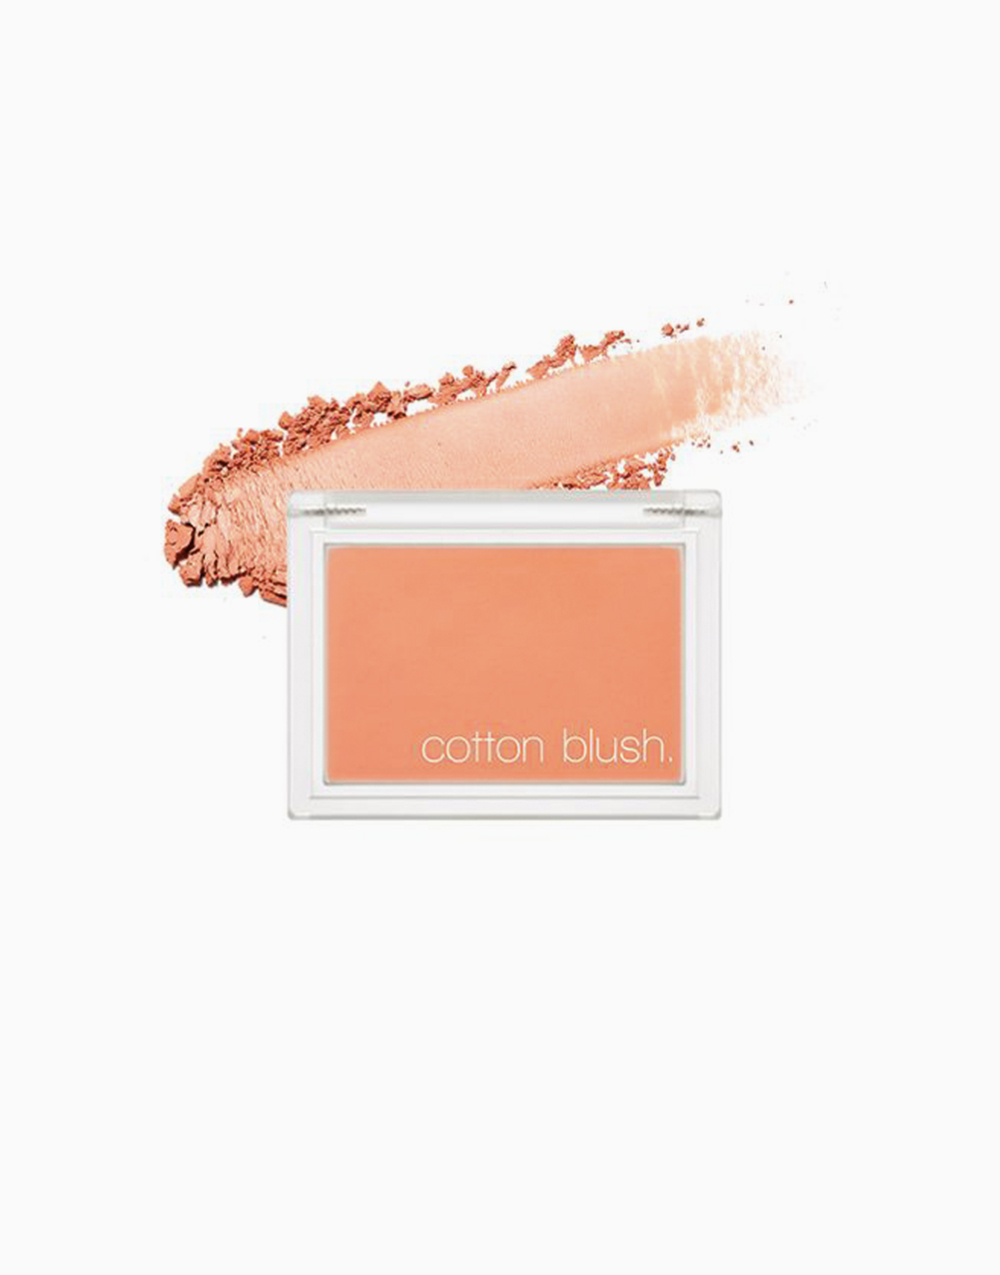 Cotton Blush by Missha | Carrot Buttercream